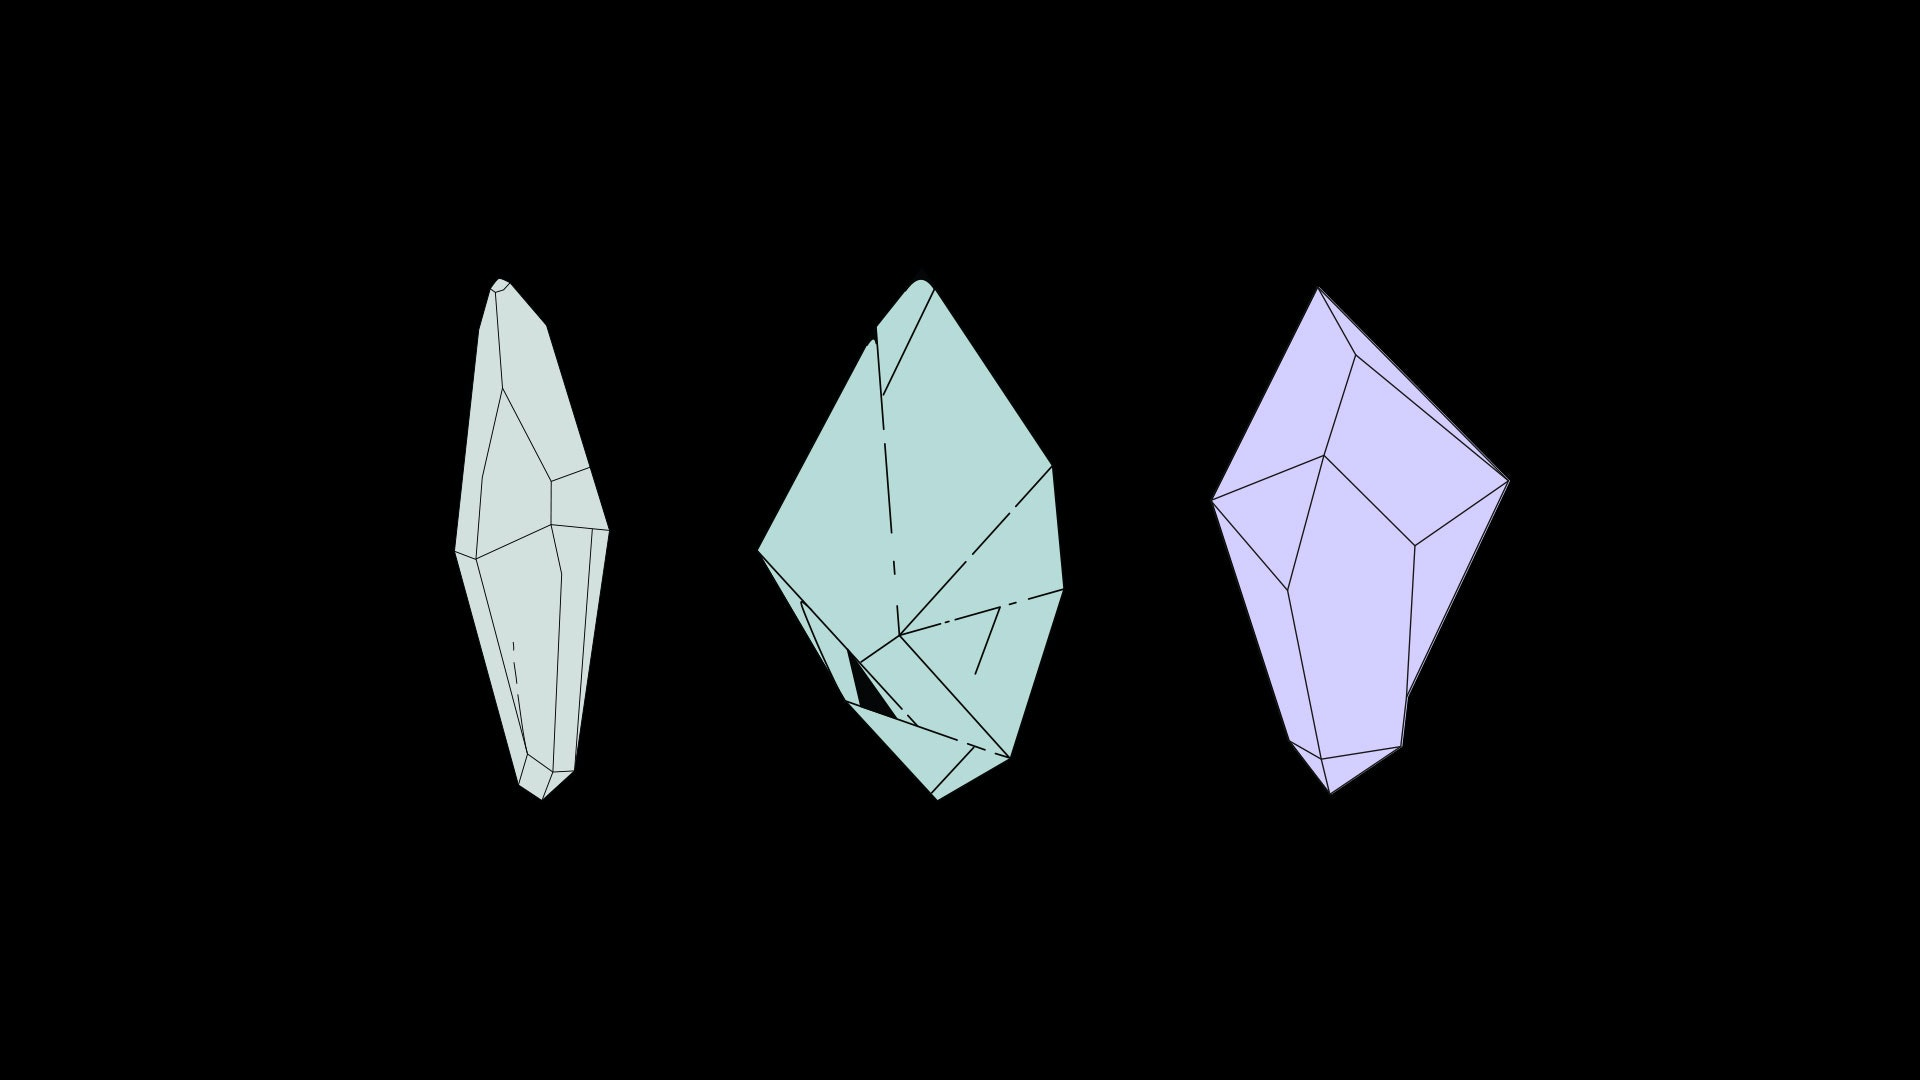 3D diamond drafts